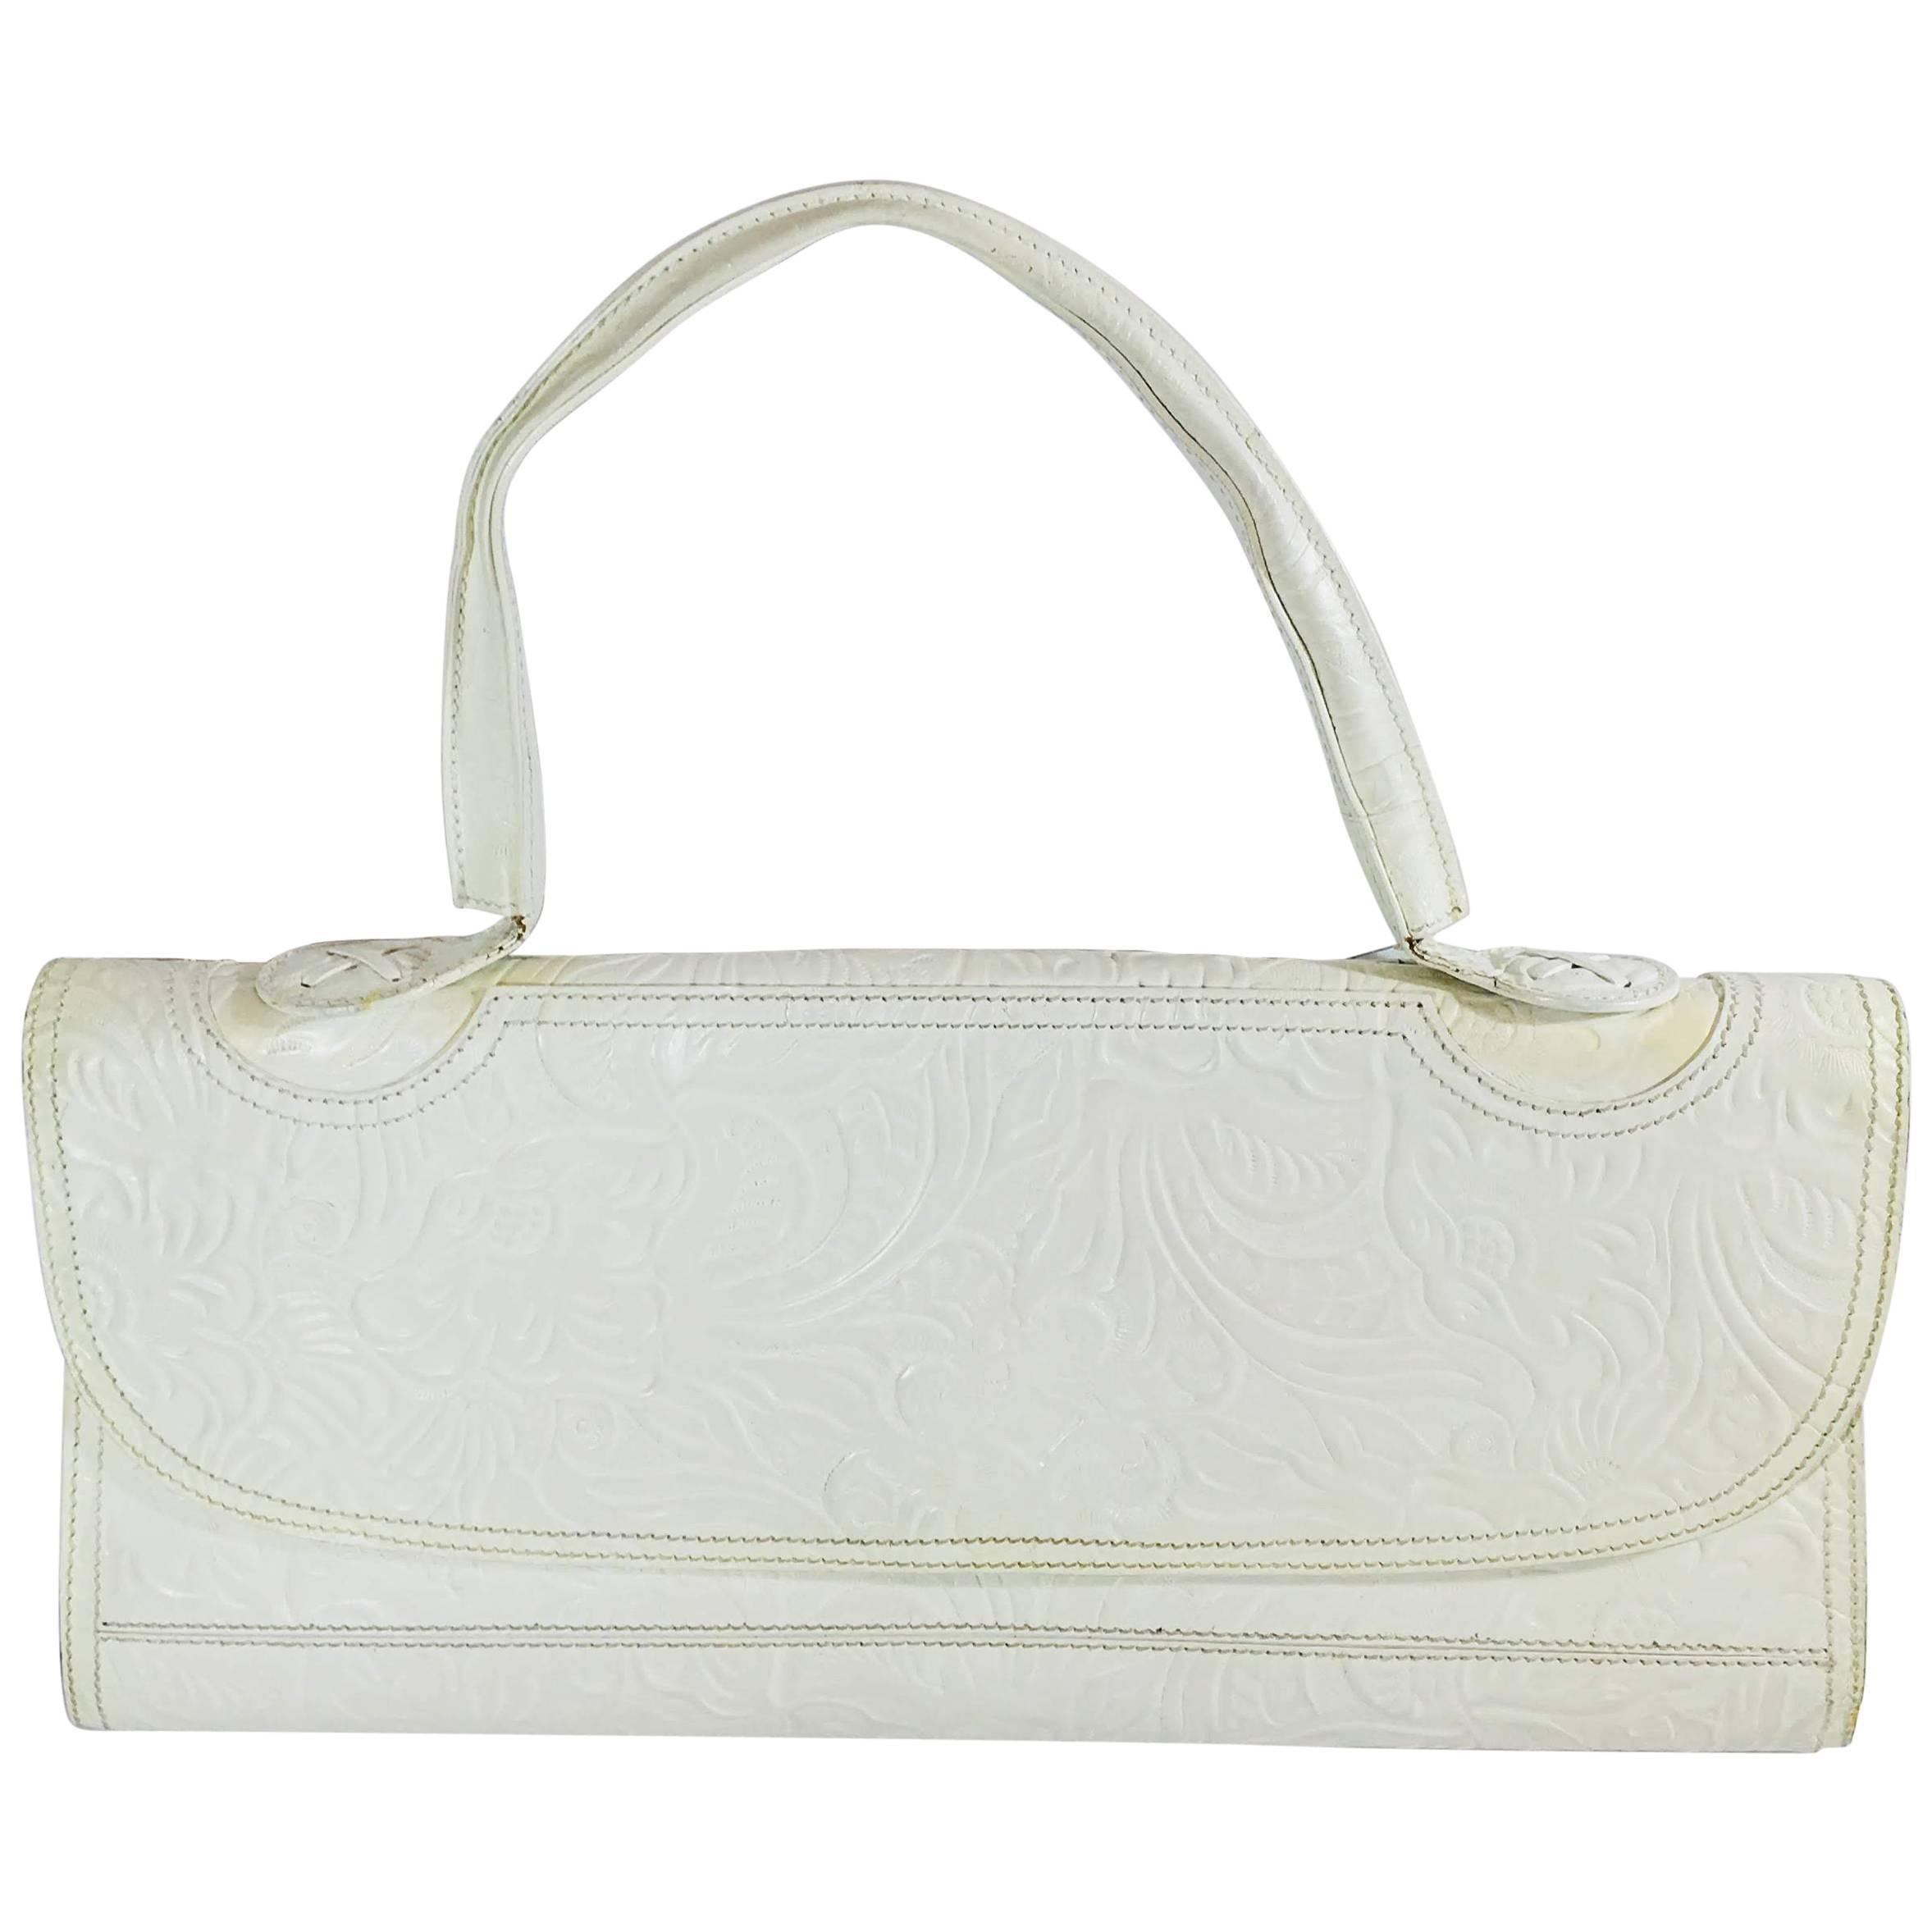 Fendi Floral Embossed Frame Bag fY0EoVuM